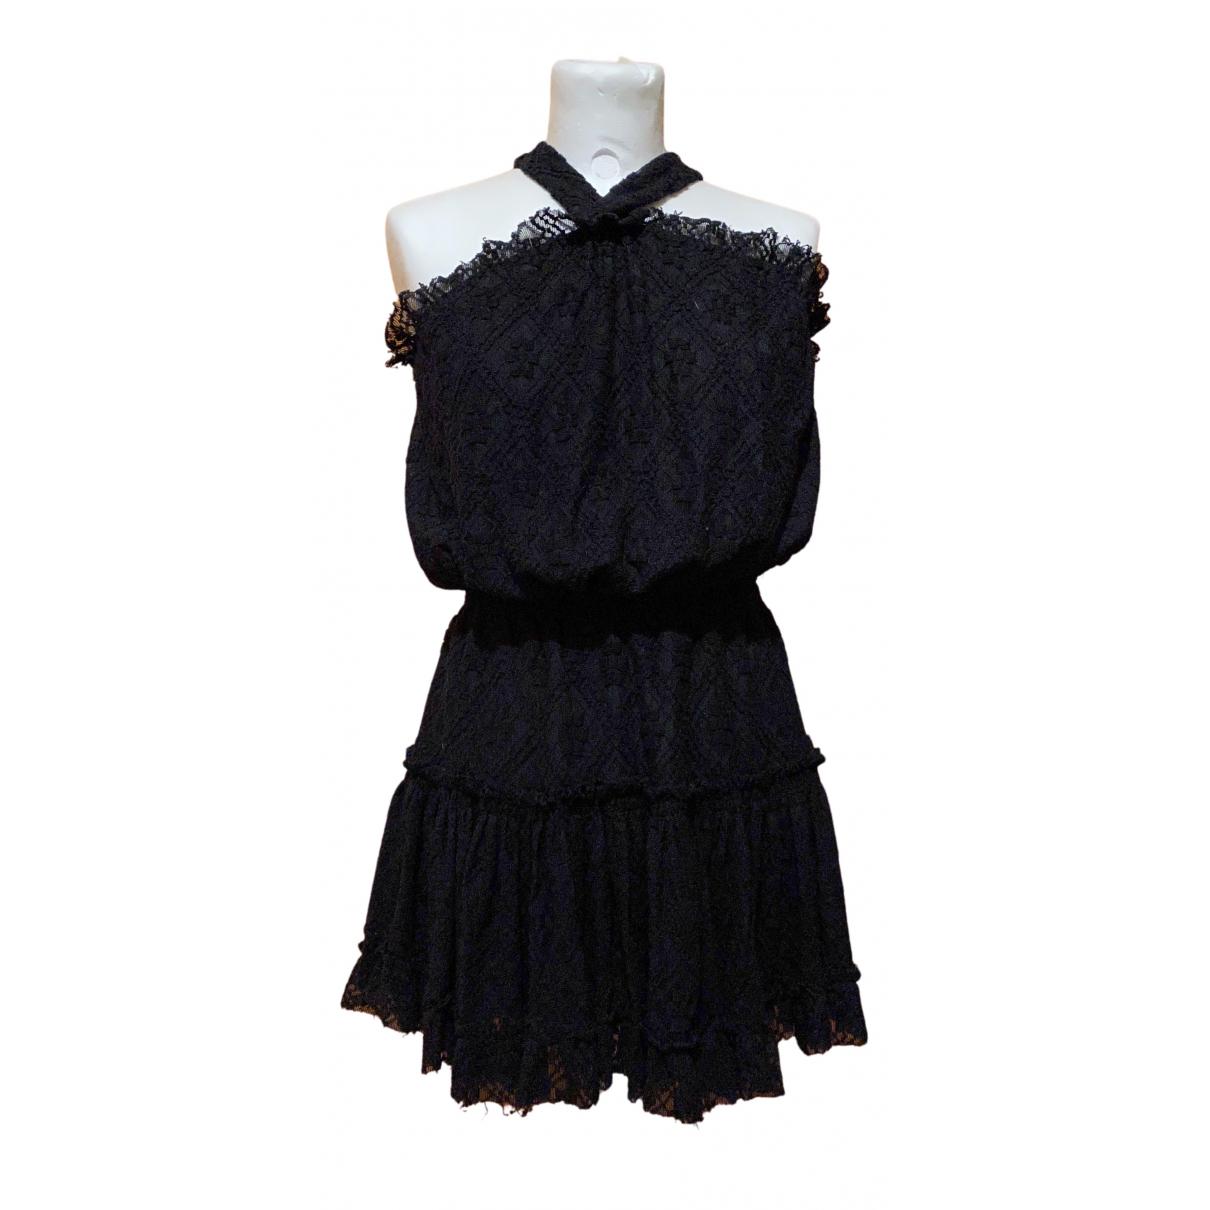 Misa \N Kleid in  Schwarz Polyester